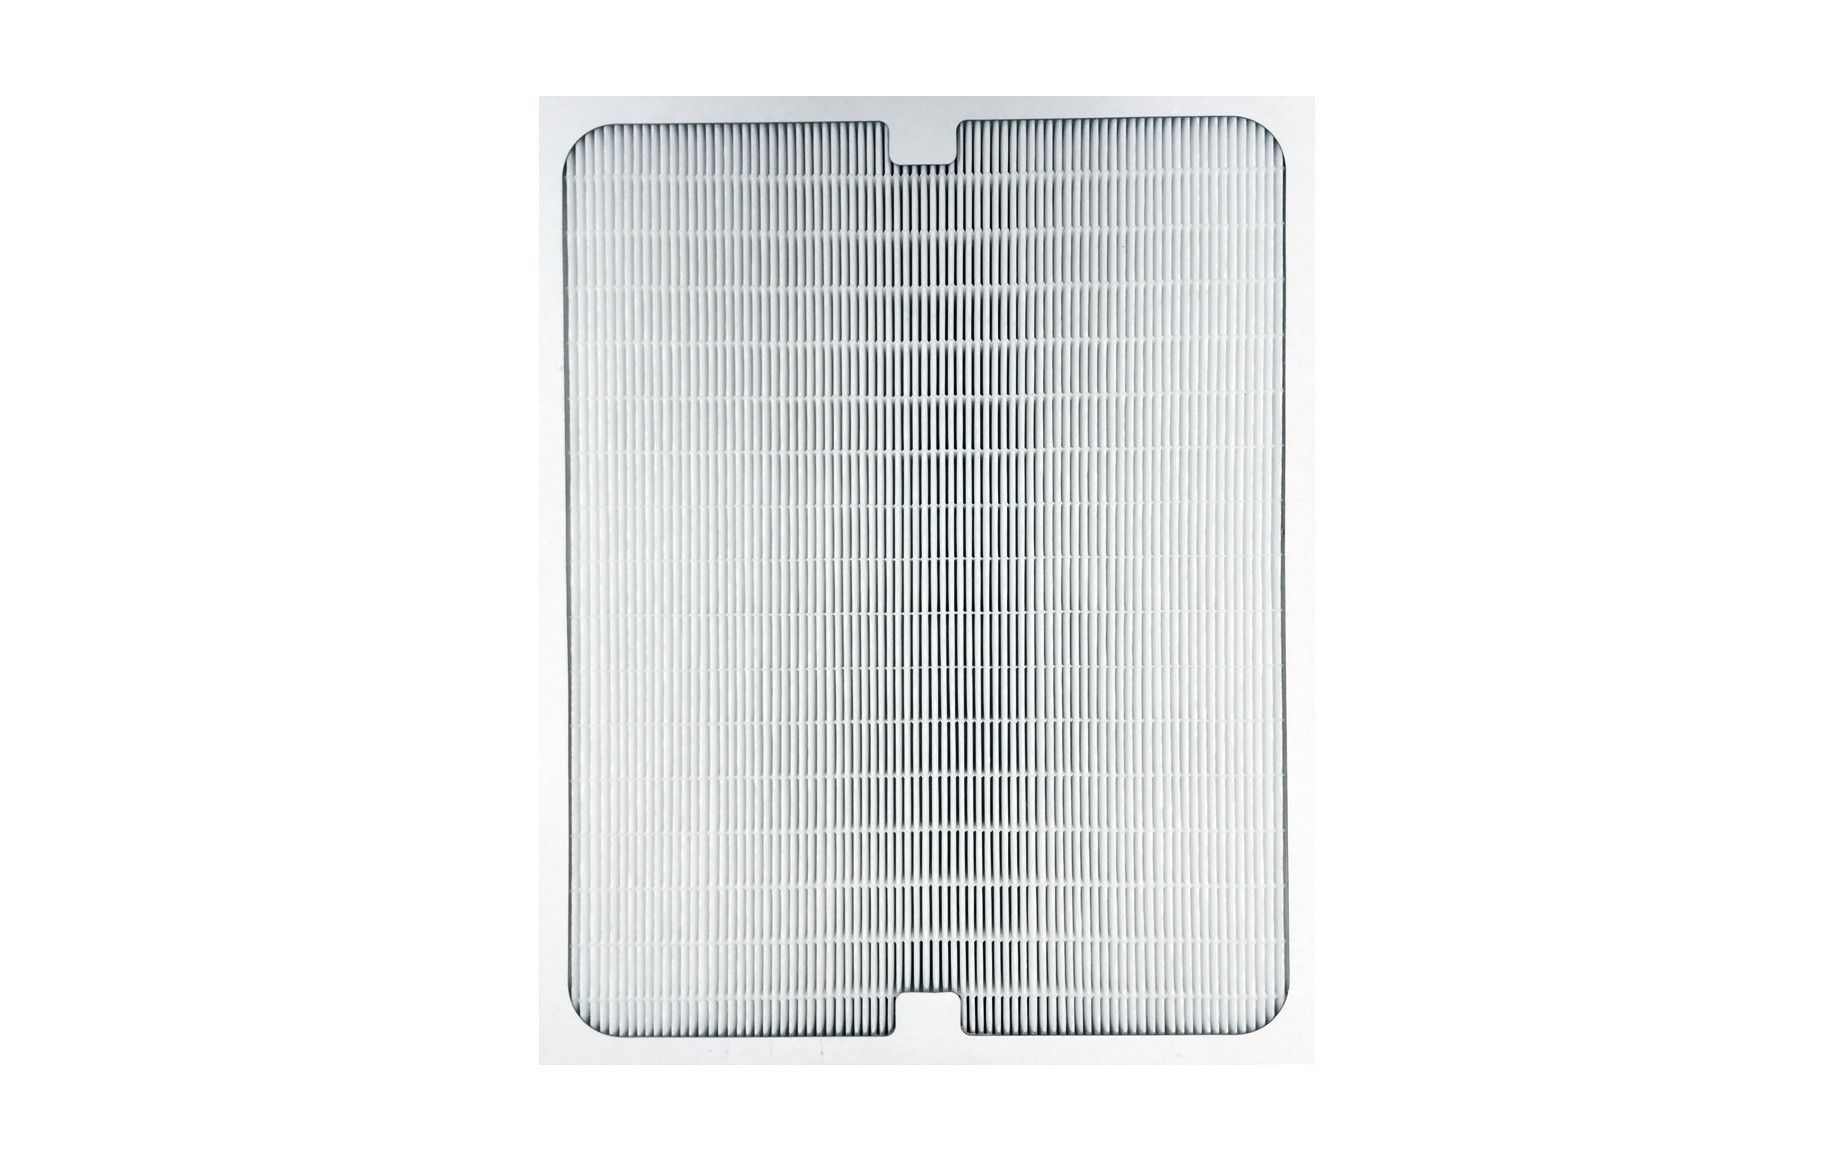 Replacement Air Purifier Filter For Blueair 200 300 Series